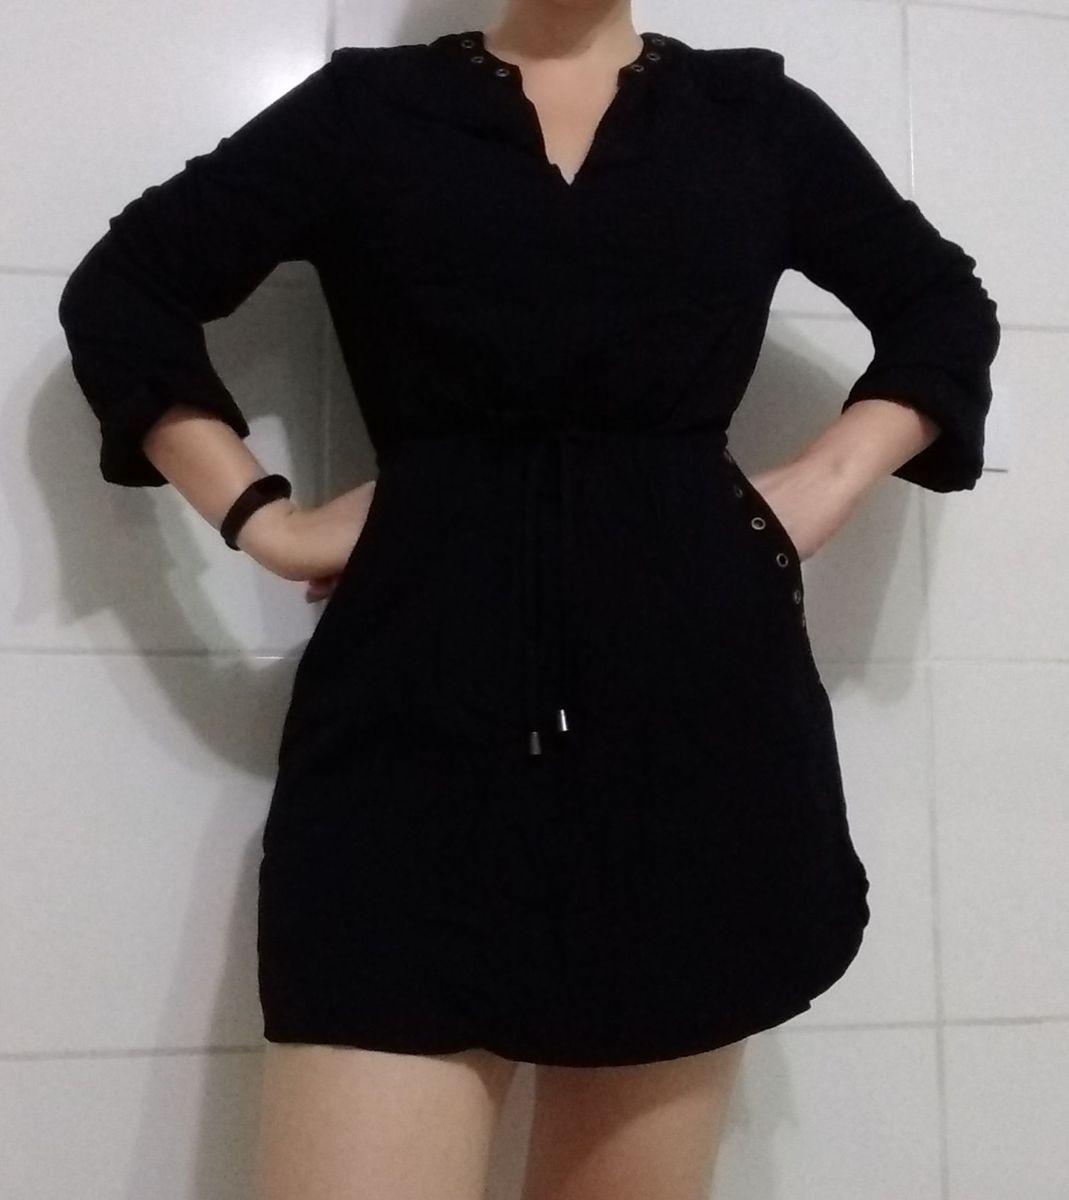 a647fbfaa6f vestido preto forever 21 - vestidos forever 21.  Czm6ly9wag90b3muzw5qb2vplmnvbs5ici9wcm9kdwn0cy8ynzm3njkvmwewntc0odm5ytqwm2rmowm3mdk0mti1nwfjn2y5zgquanbn  ...